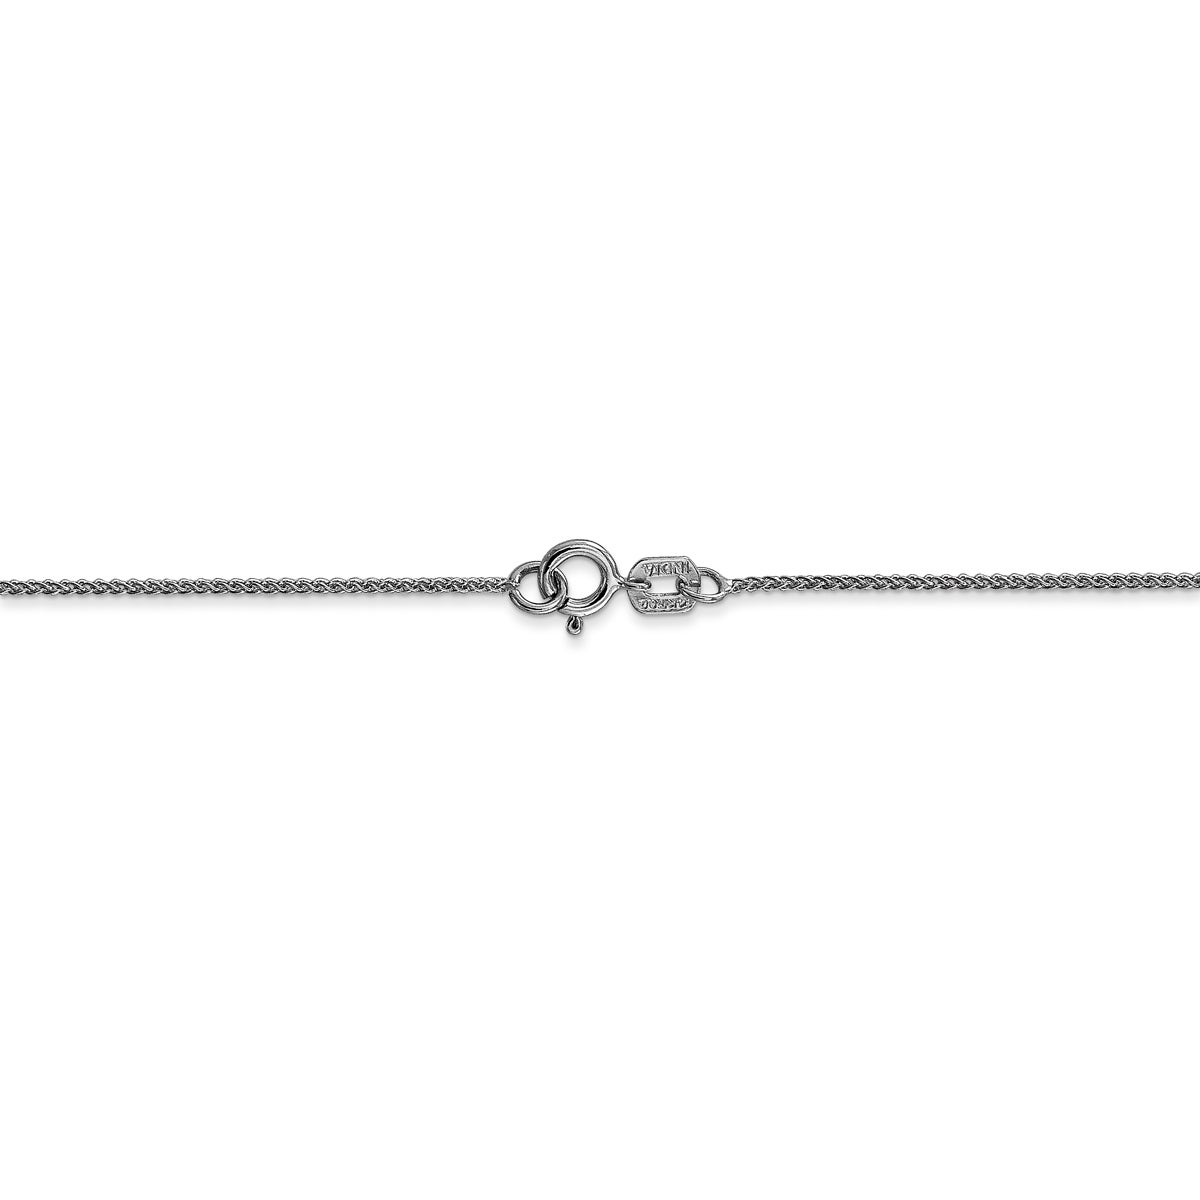 14k 0.80mm Spiga Pendant Chain